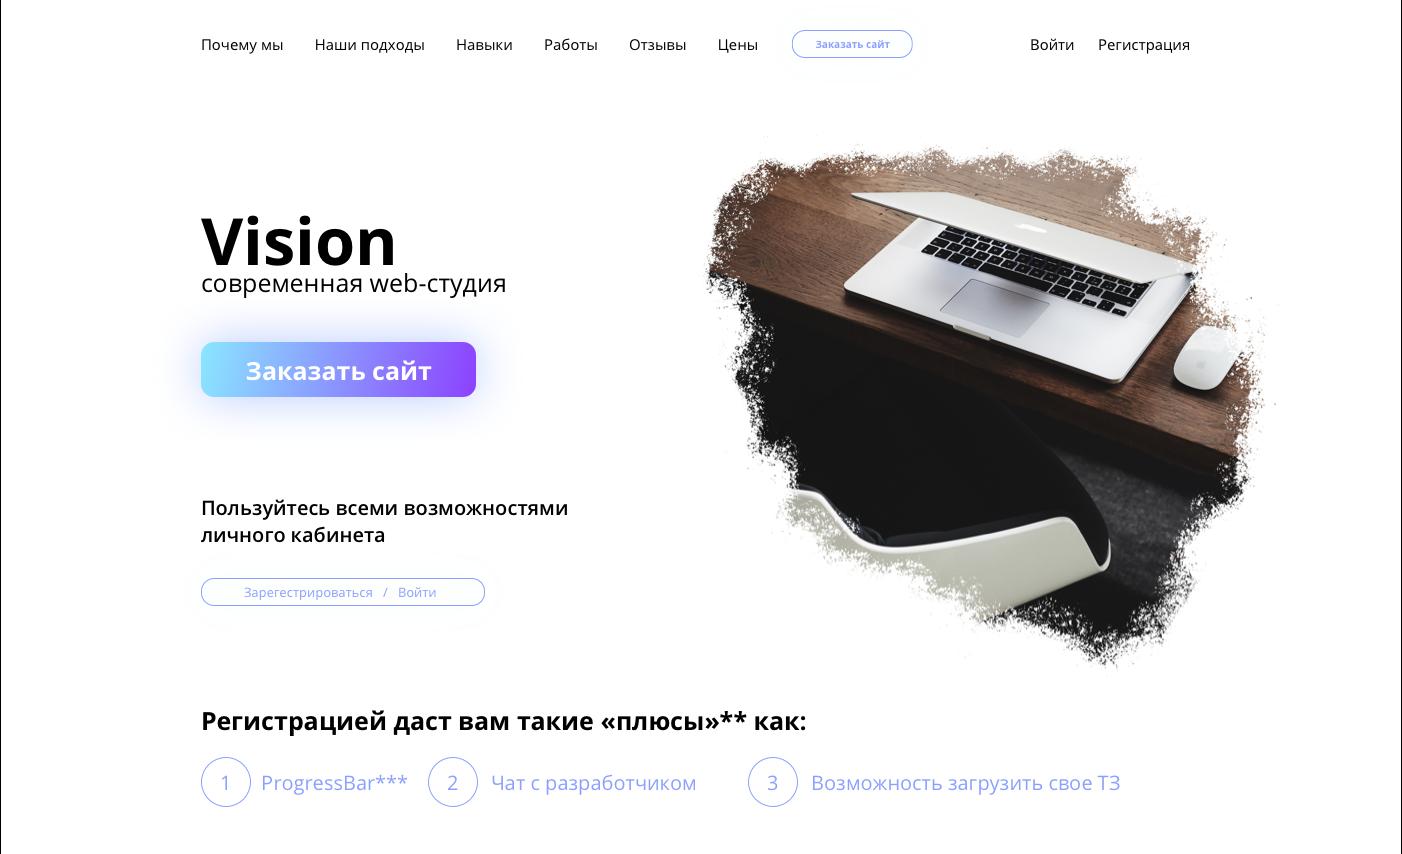 Дизайн главной страницы интернет-магазина фото f_2585e1d51e5a3364.png